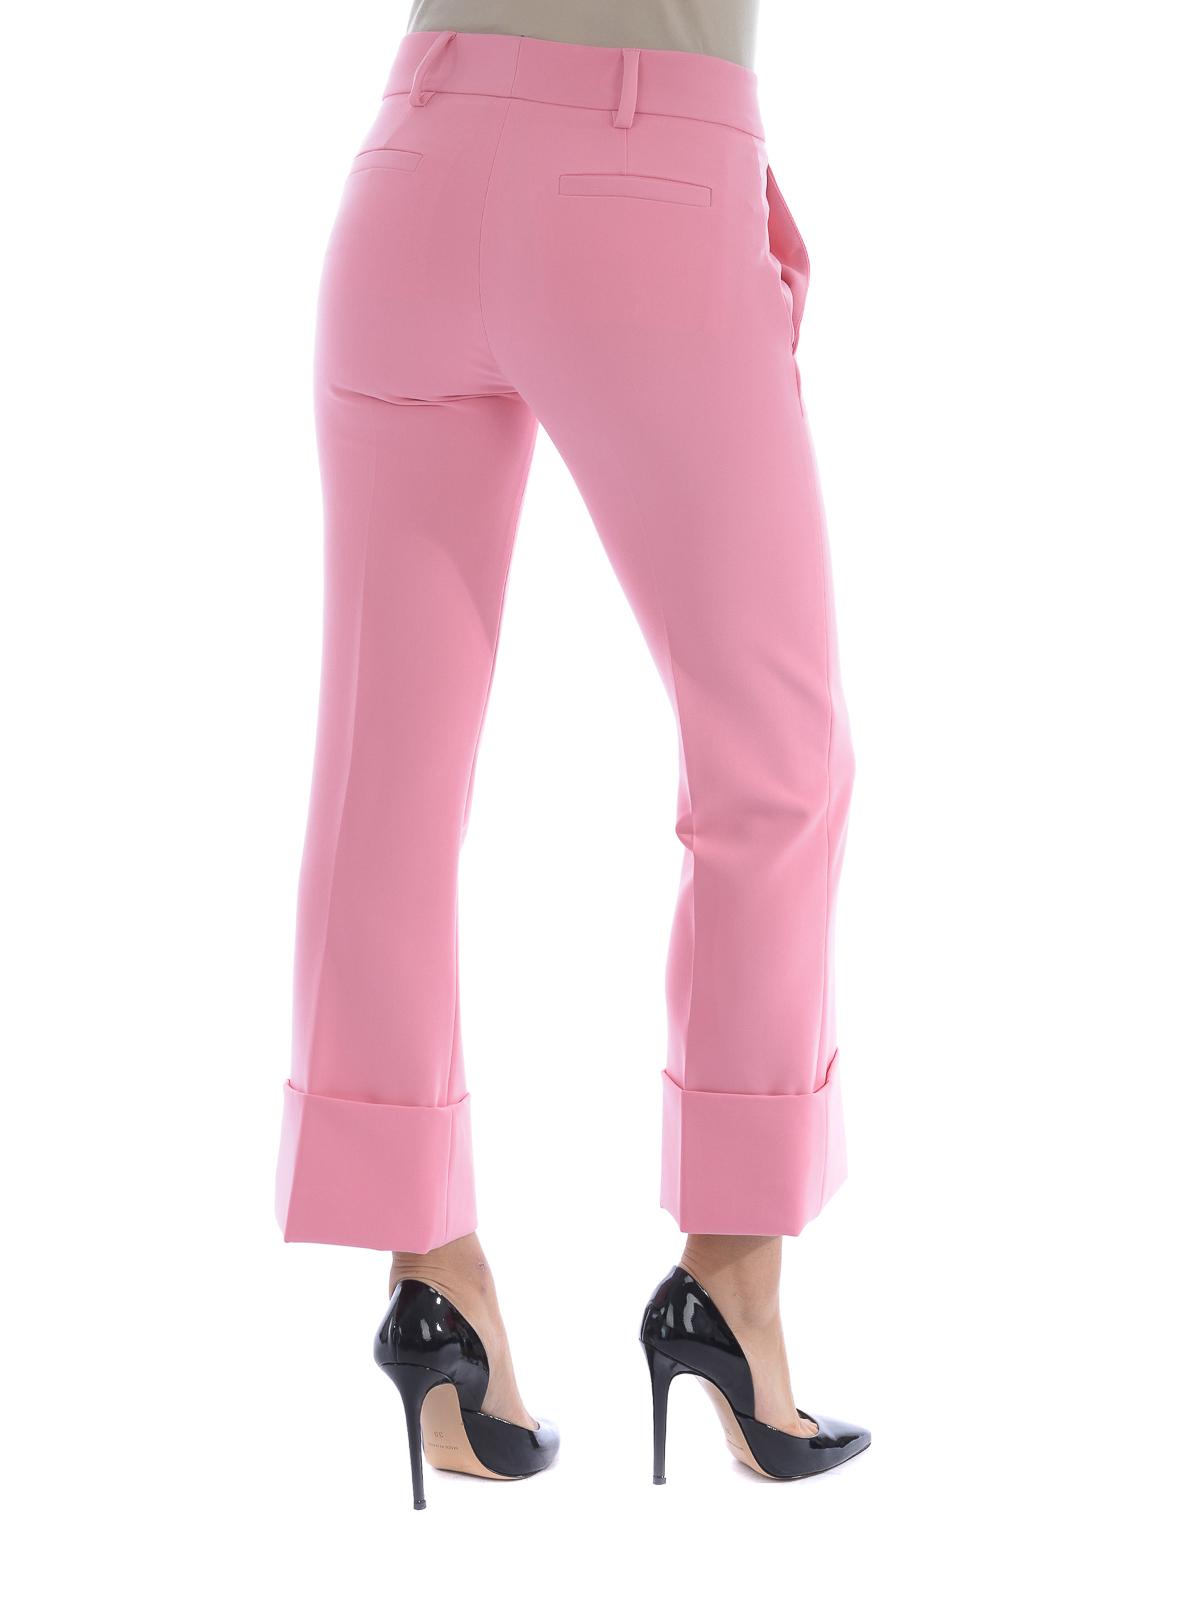 Versus Versace Pantalon De Traje Rosado Para Mujer Pantalones Casual Bd40329bt20861b1244